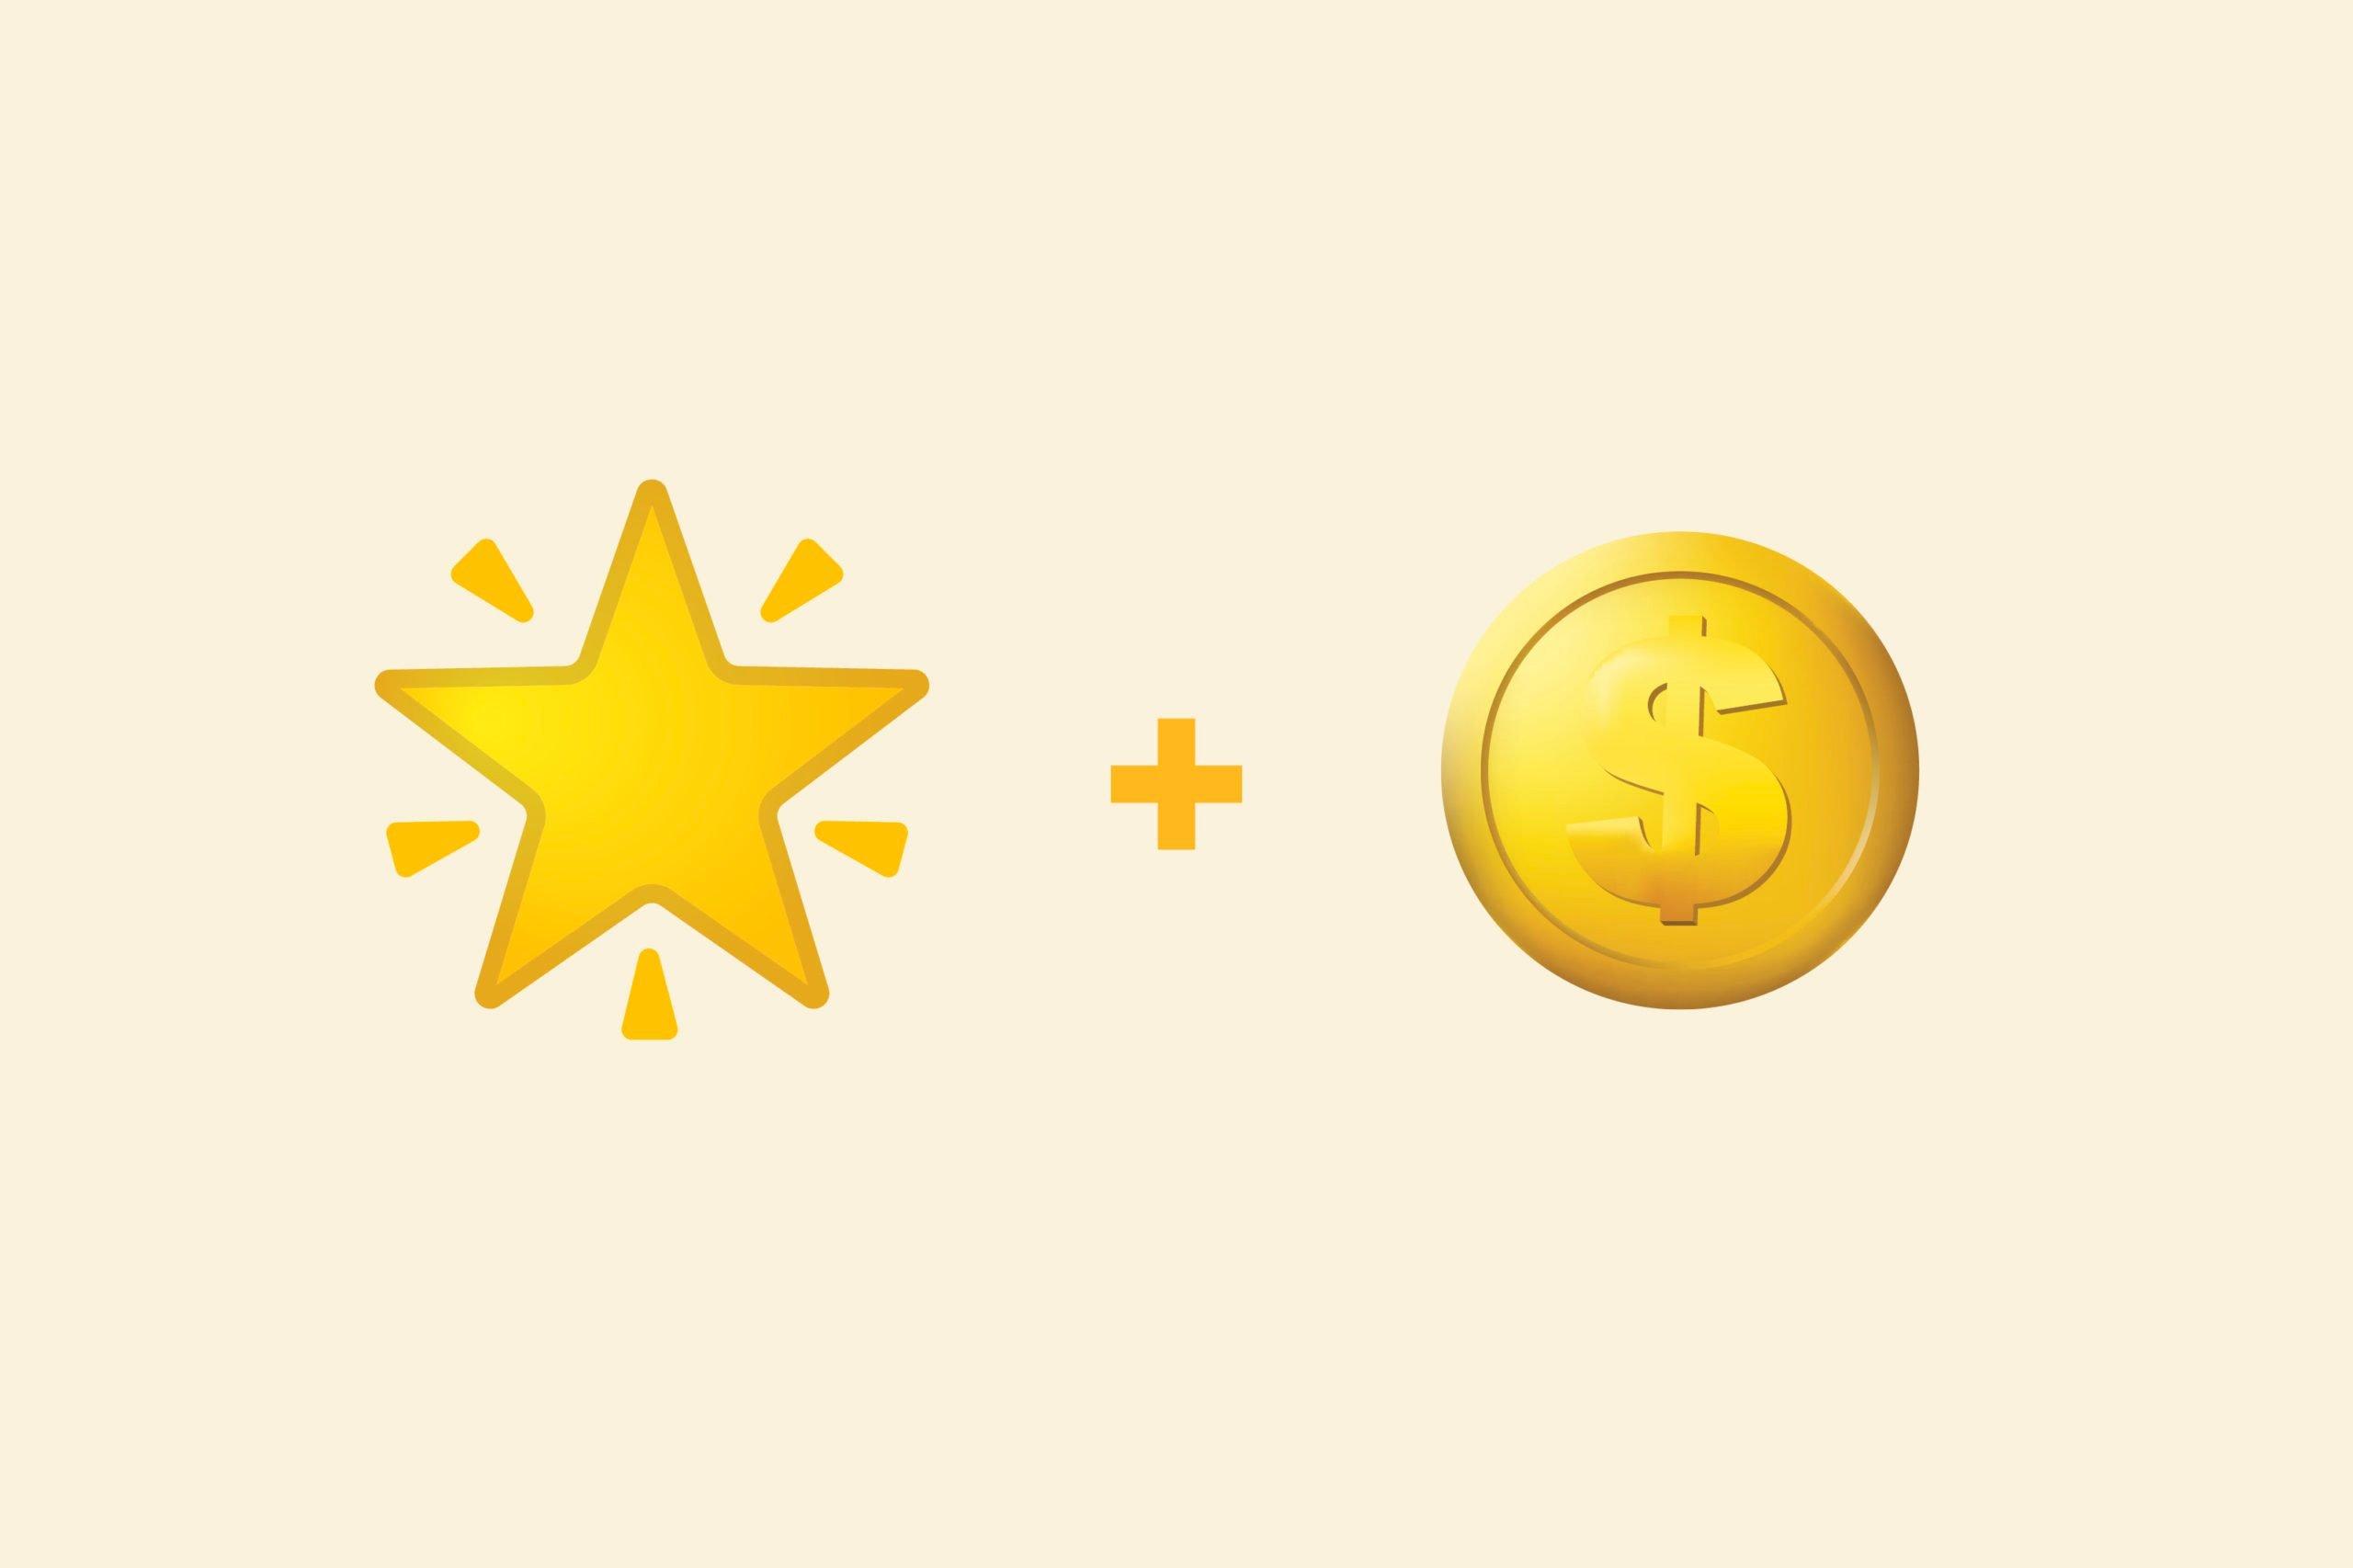 Star emoji + money emoji